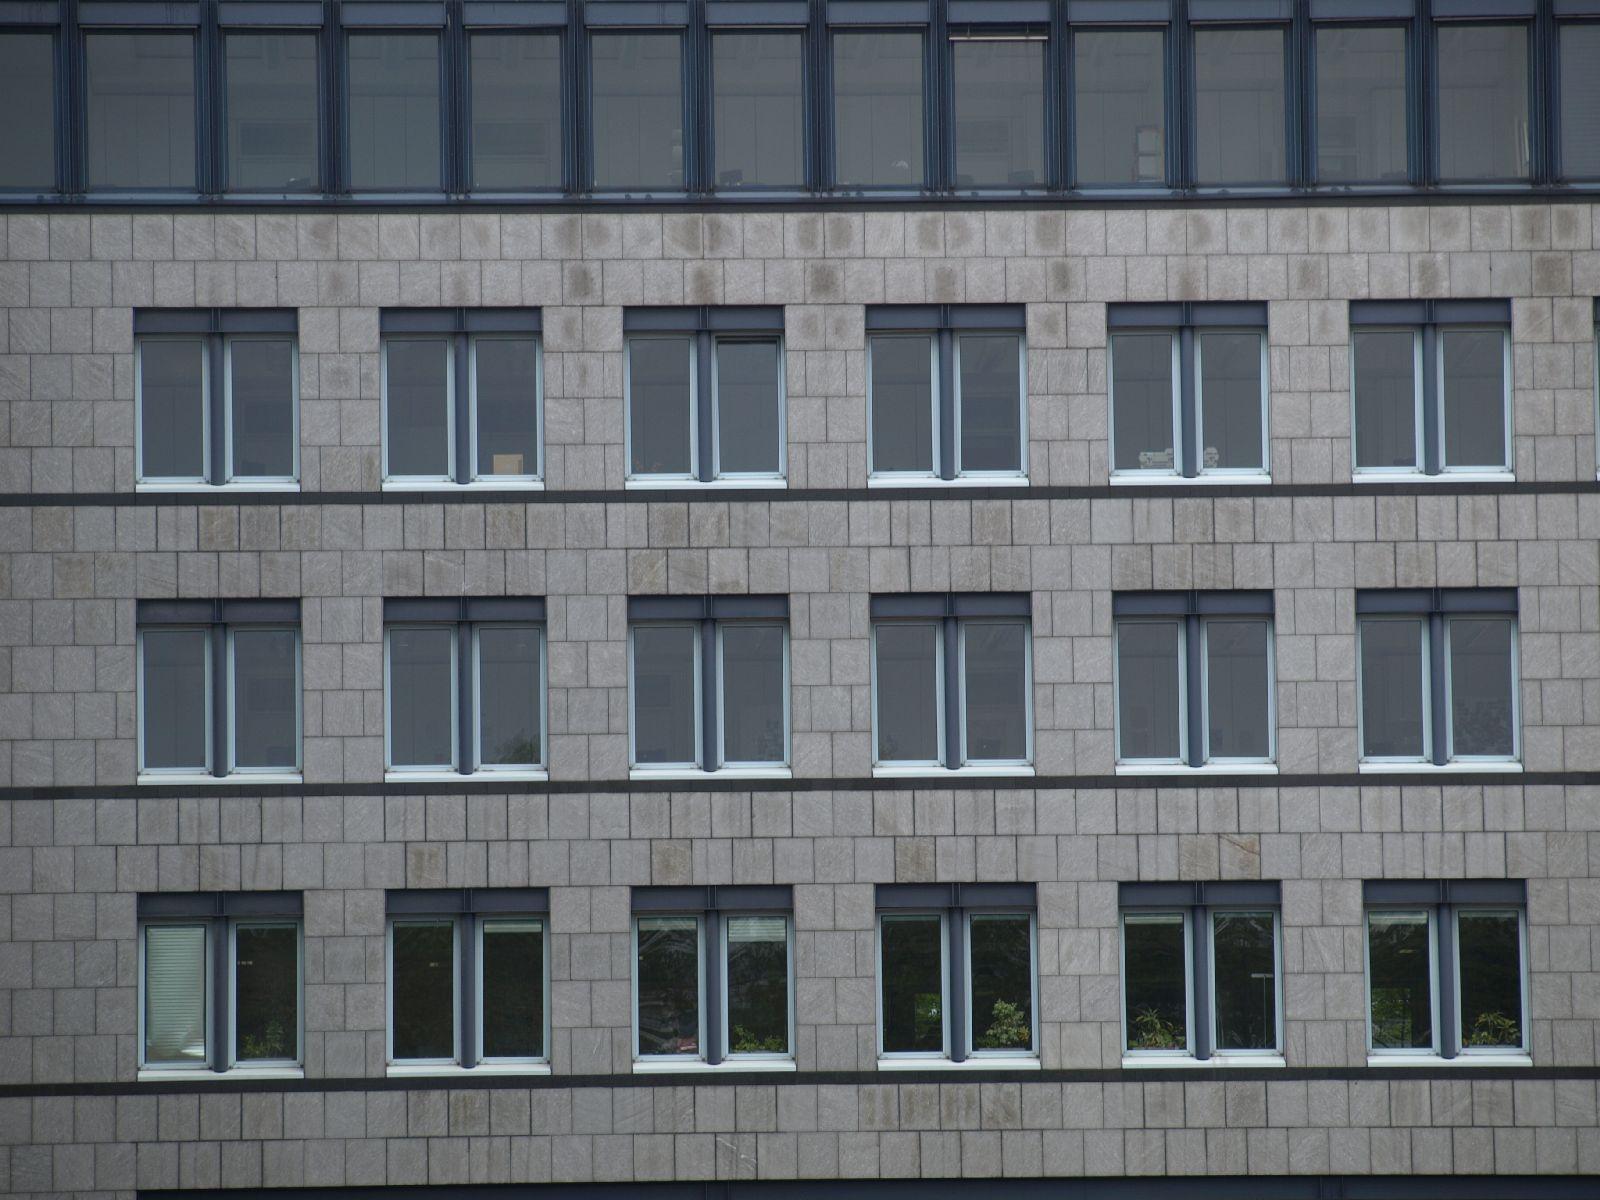 Gebaeude-Architektur_Textur_A_P6218071